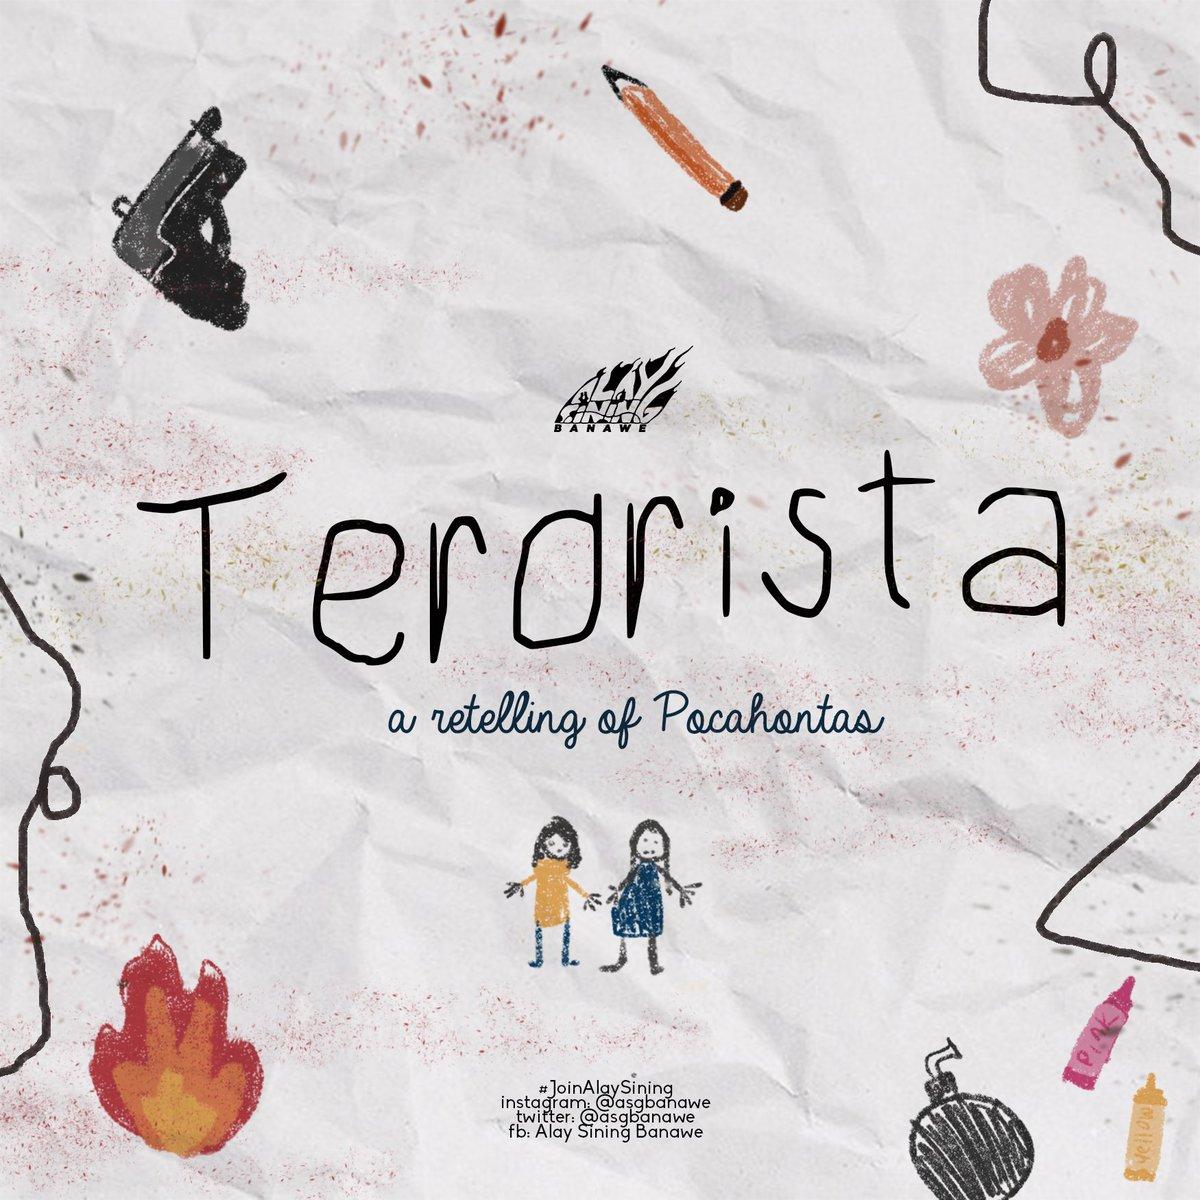 Terorista: A Retelling of Pocahontas By Alay Sining Banawe  (1/10)  #OustDuterte #JunkTerrorLaw #ArtistsFightBackpic.twitter.com/5OkFdHXfiF